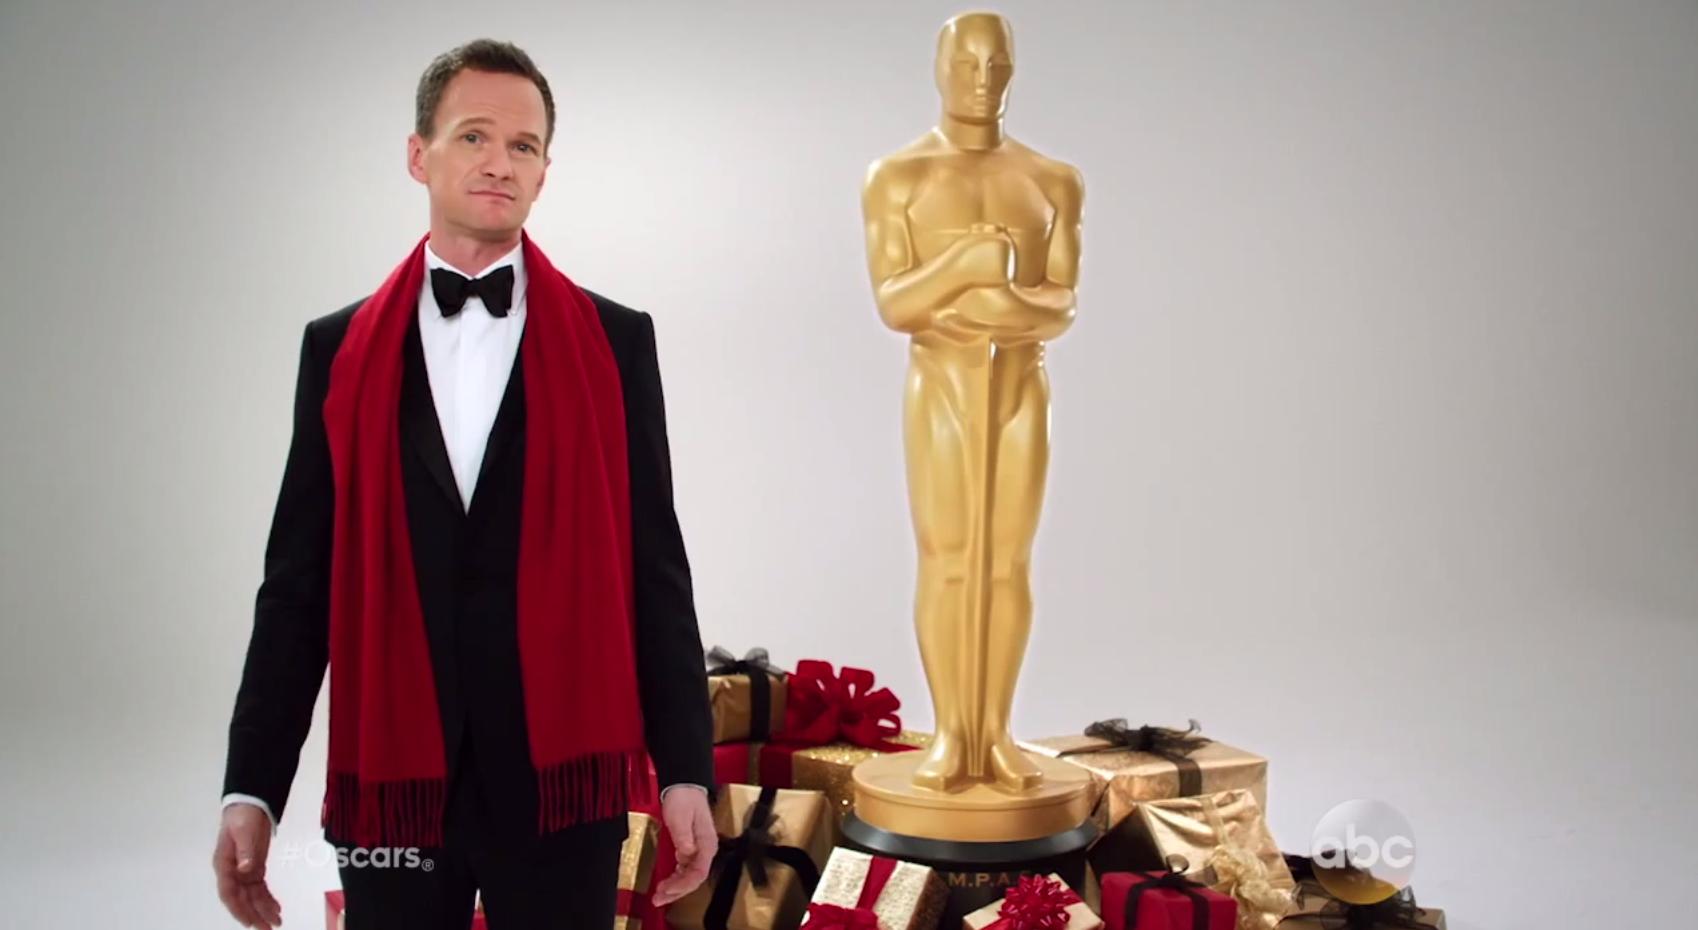 Neil Patrick Harris Oscar Promo Still - H 2014